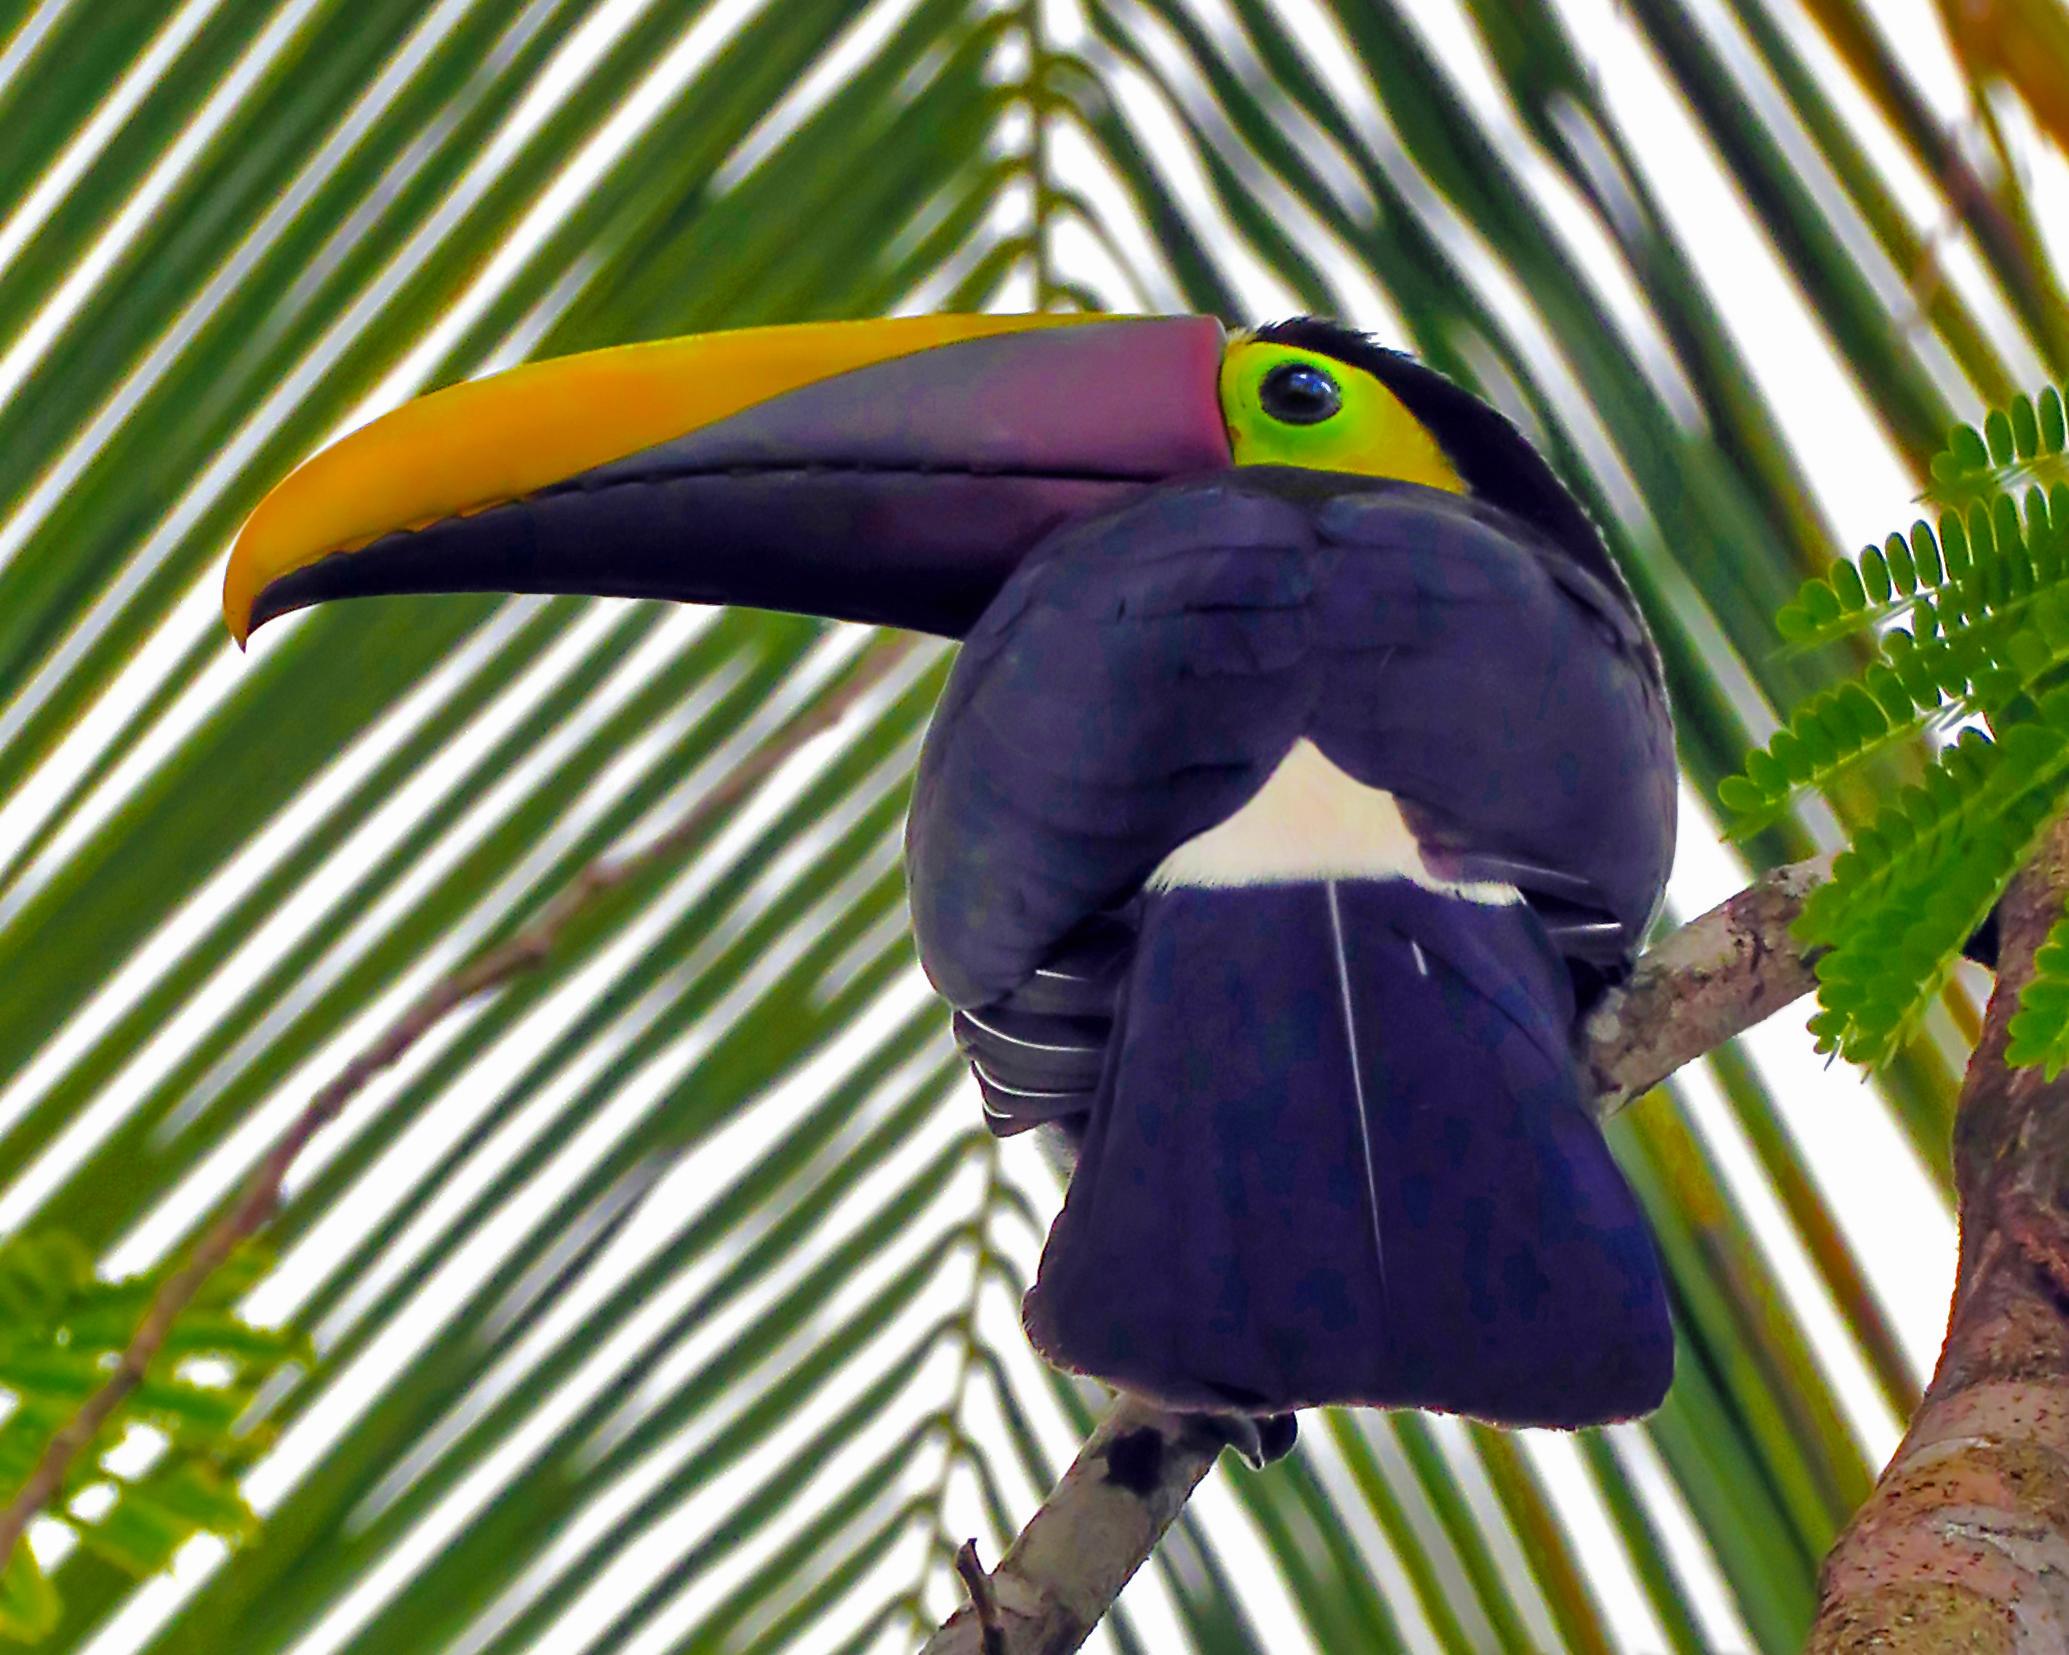 Black-mandibiled Toucan